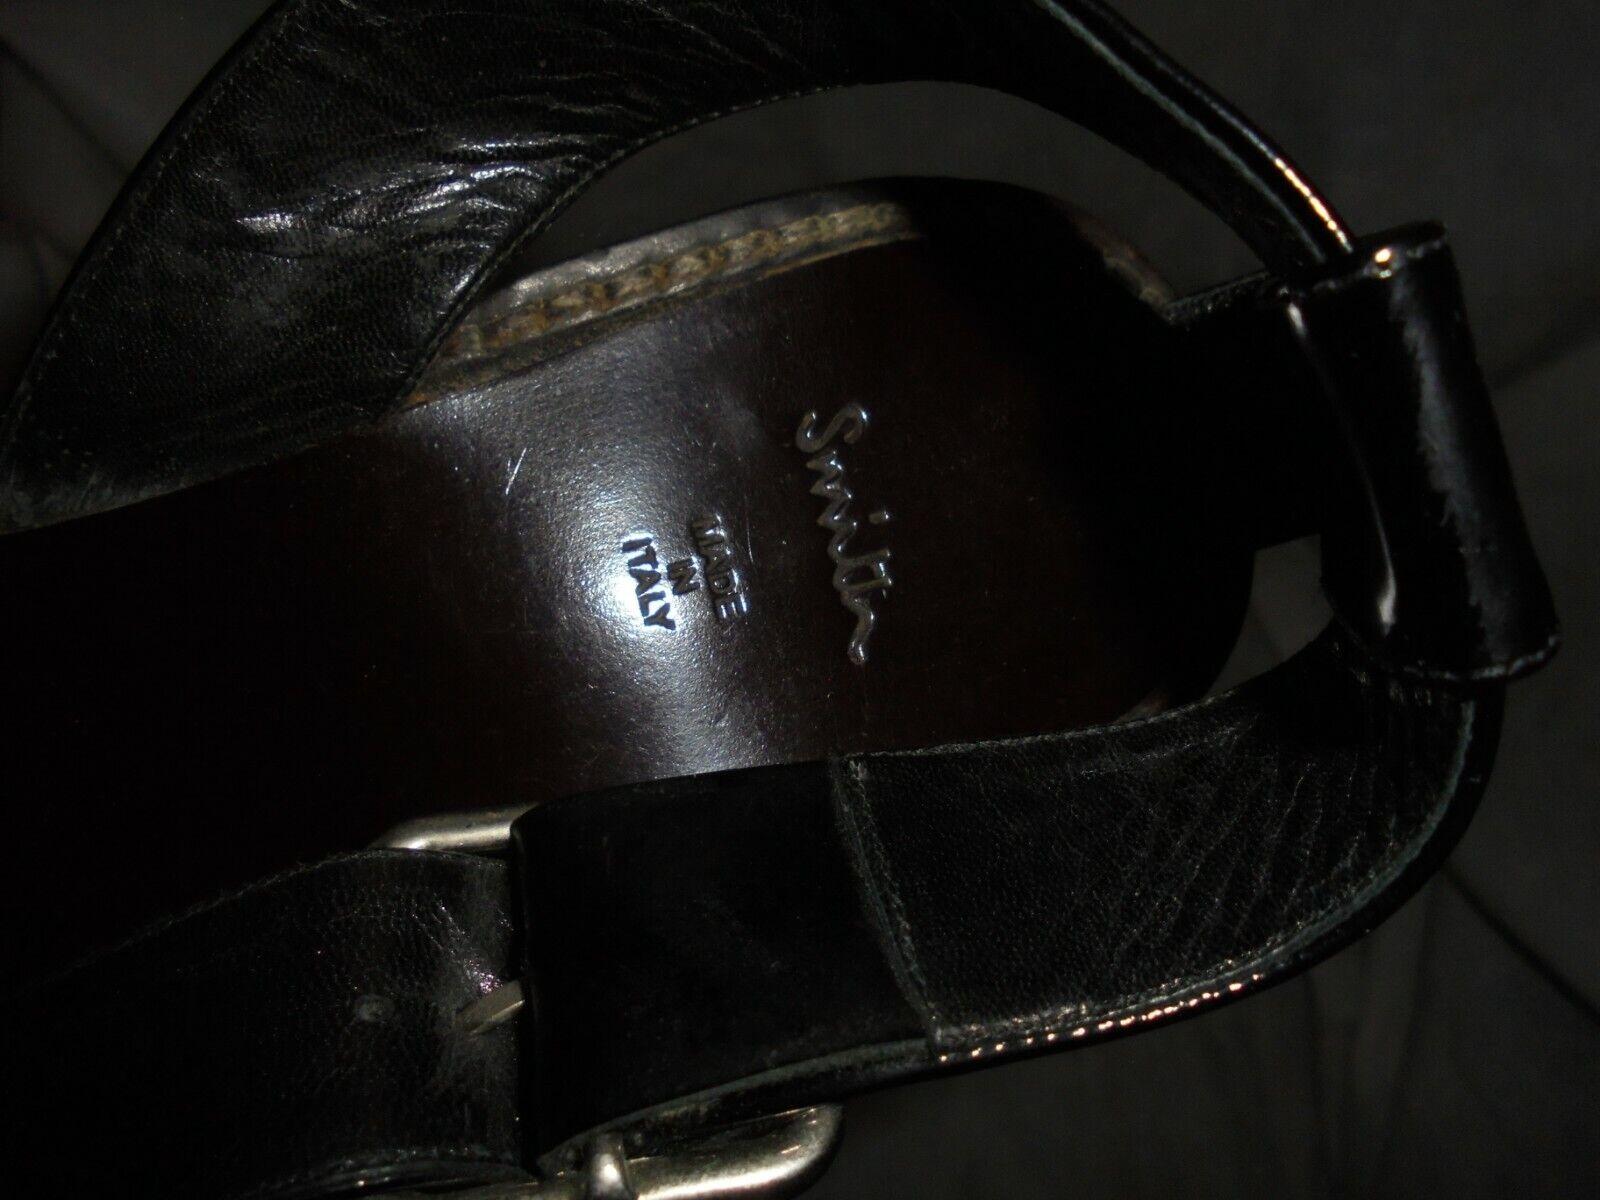 PAUL SMITH WOMEN BLACK LEATHER BUCKLE STRAP STRAP STRAP SANDAL SIZE UK 5  EU 38  VGC c3e020